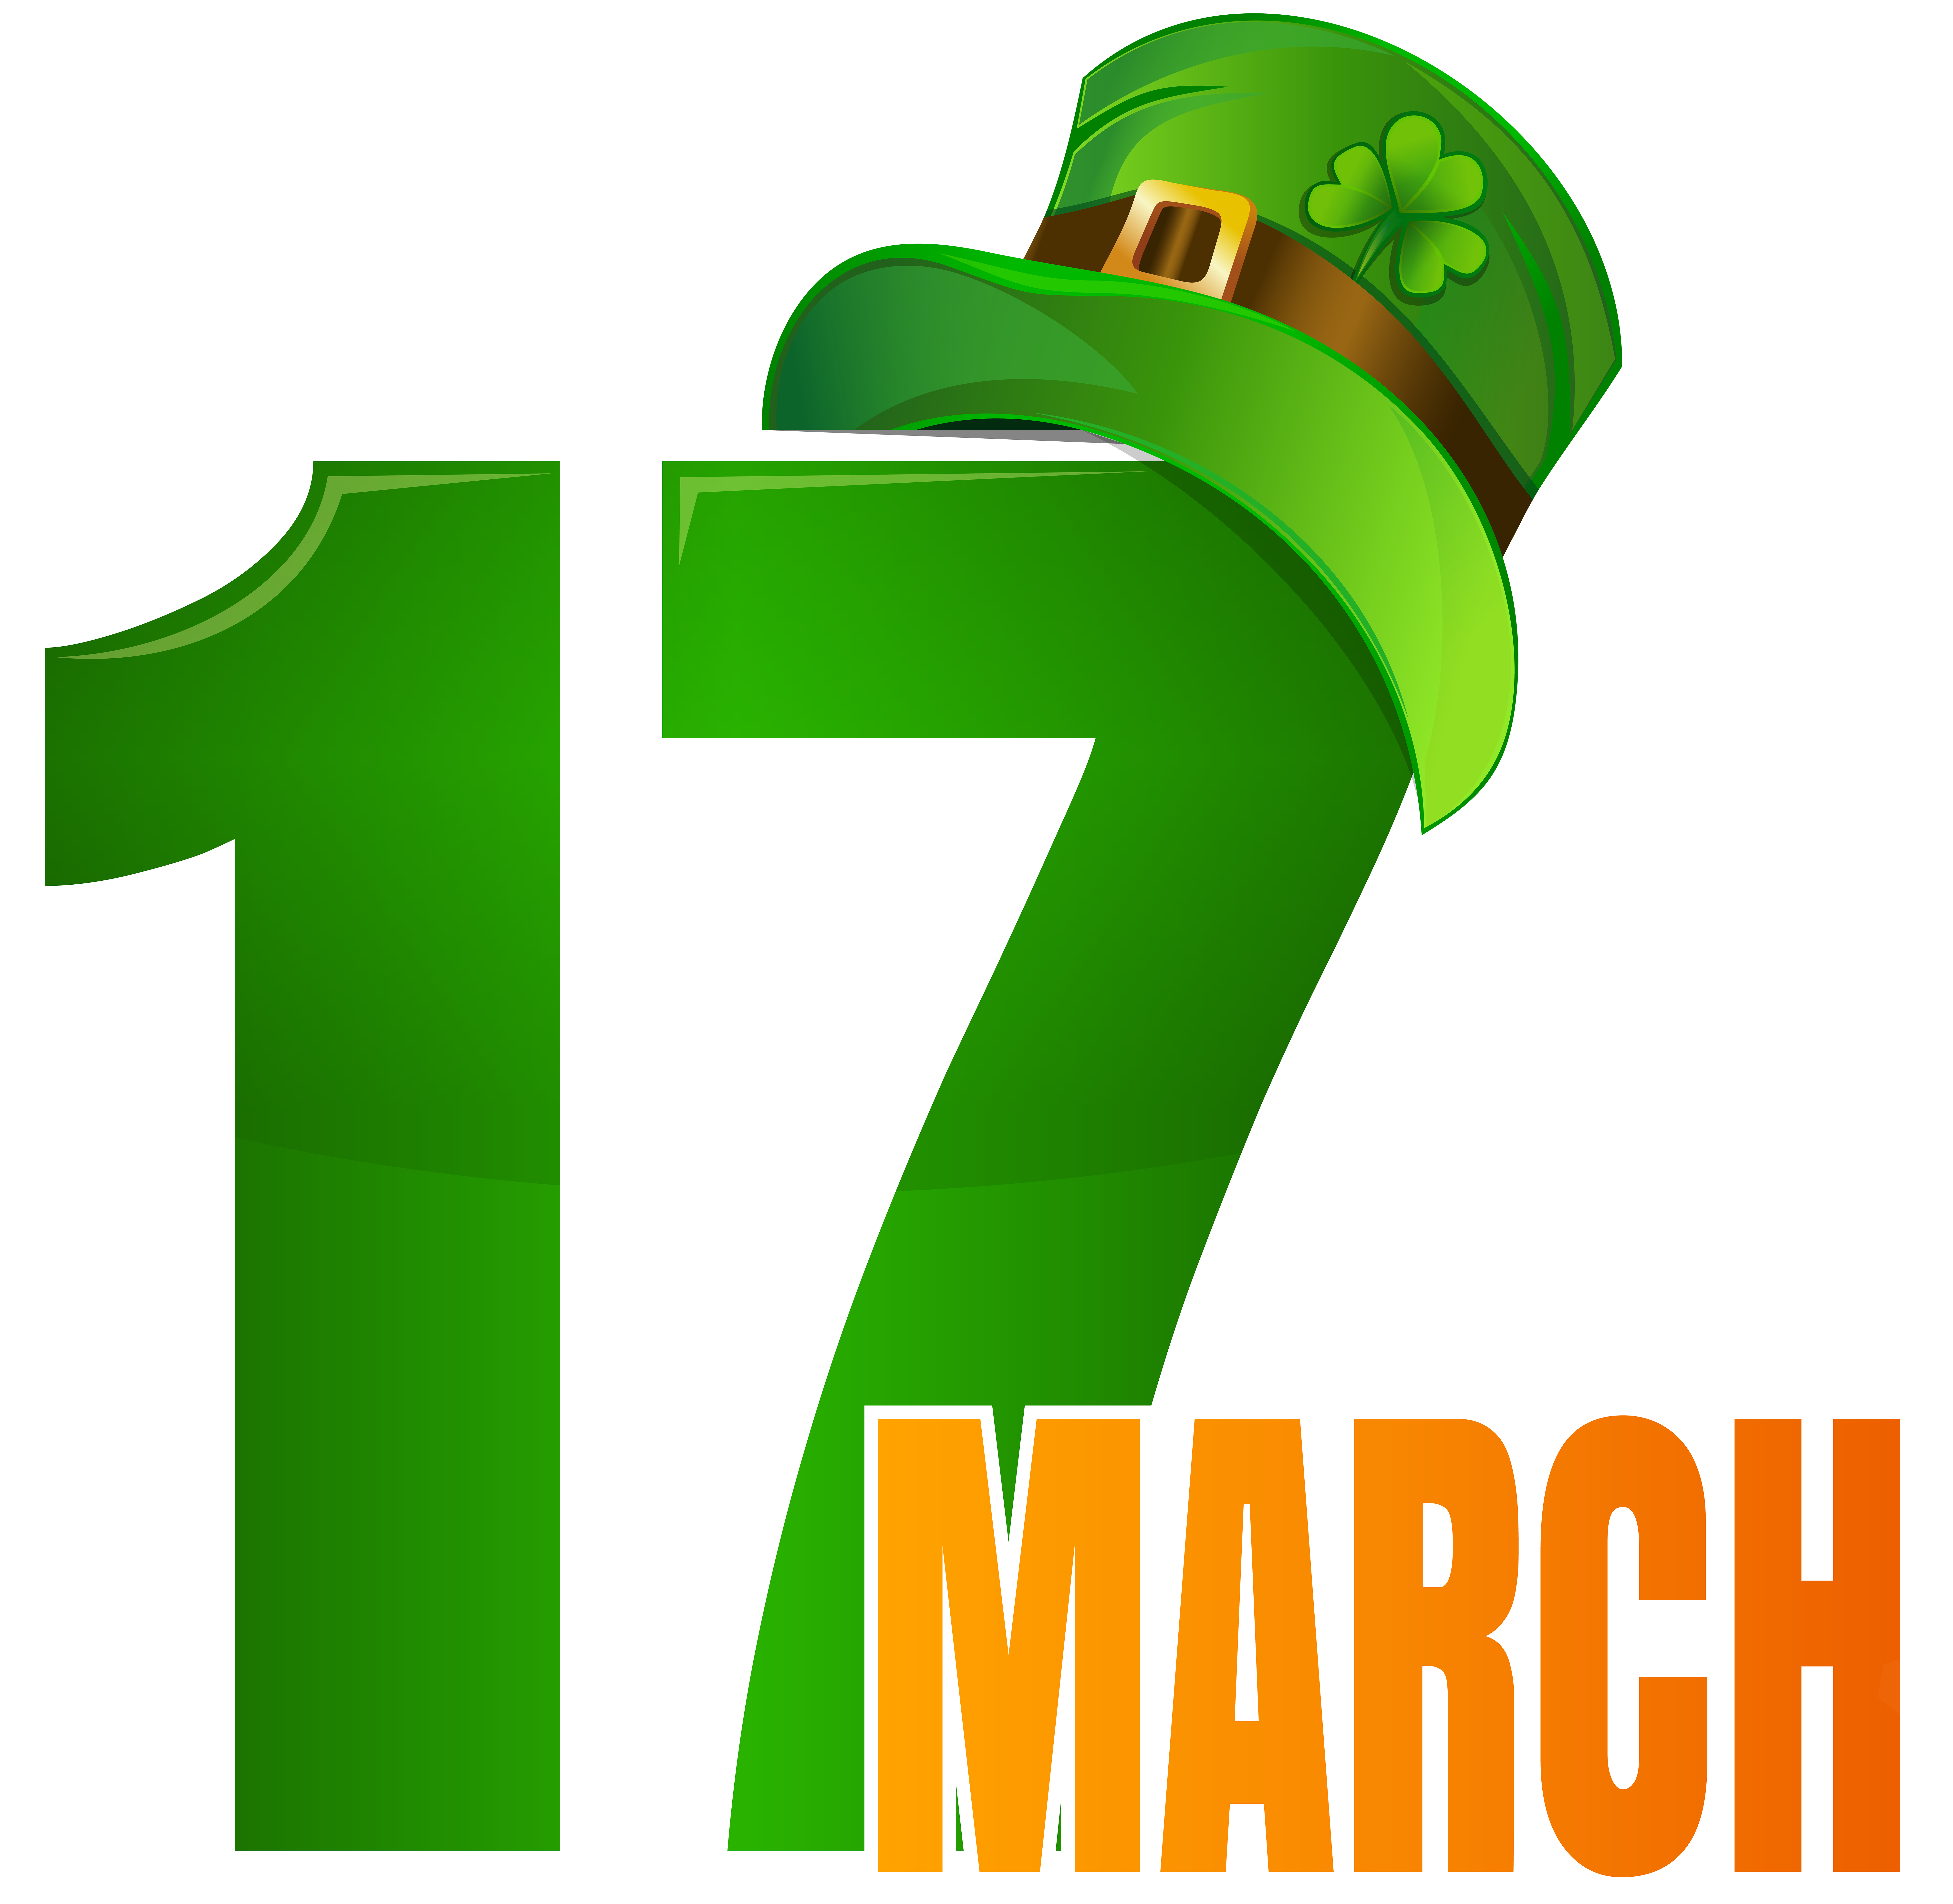 17 March St Patrick.